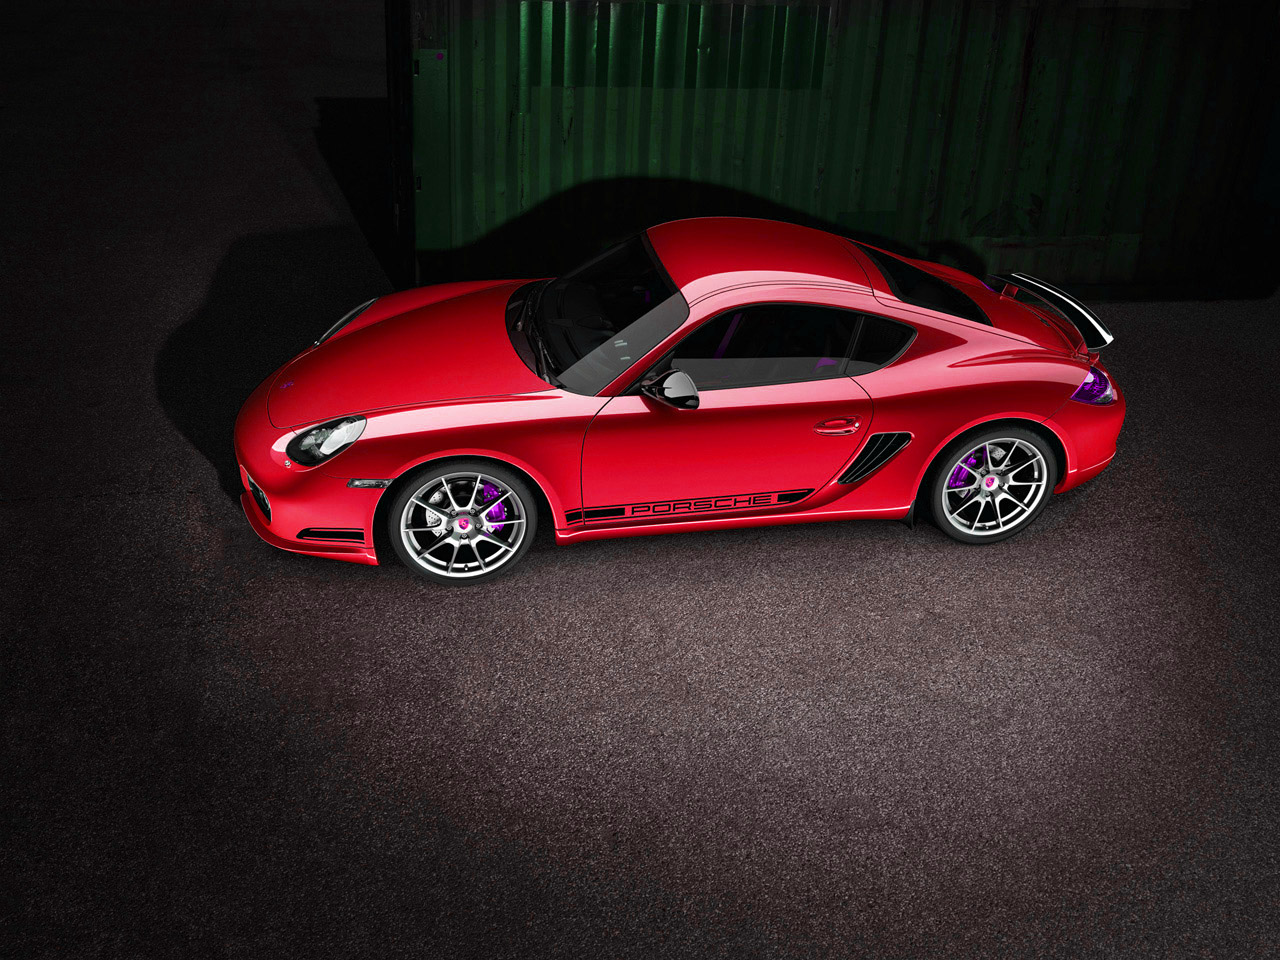 Red Porsche Car Red 2011 Porsche Cayman r